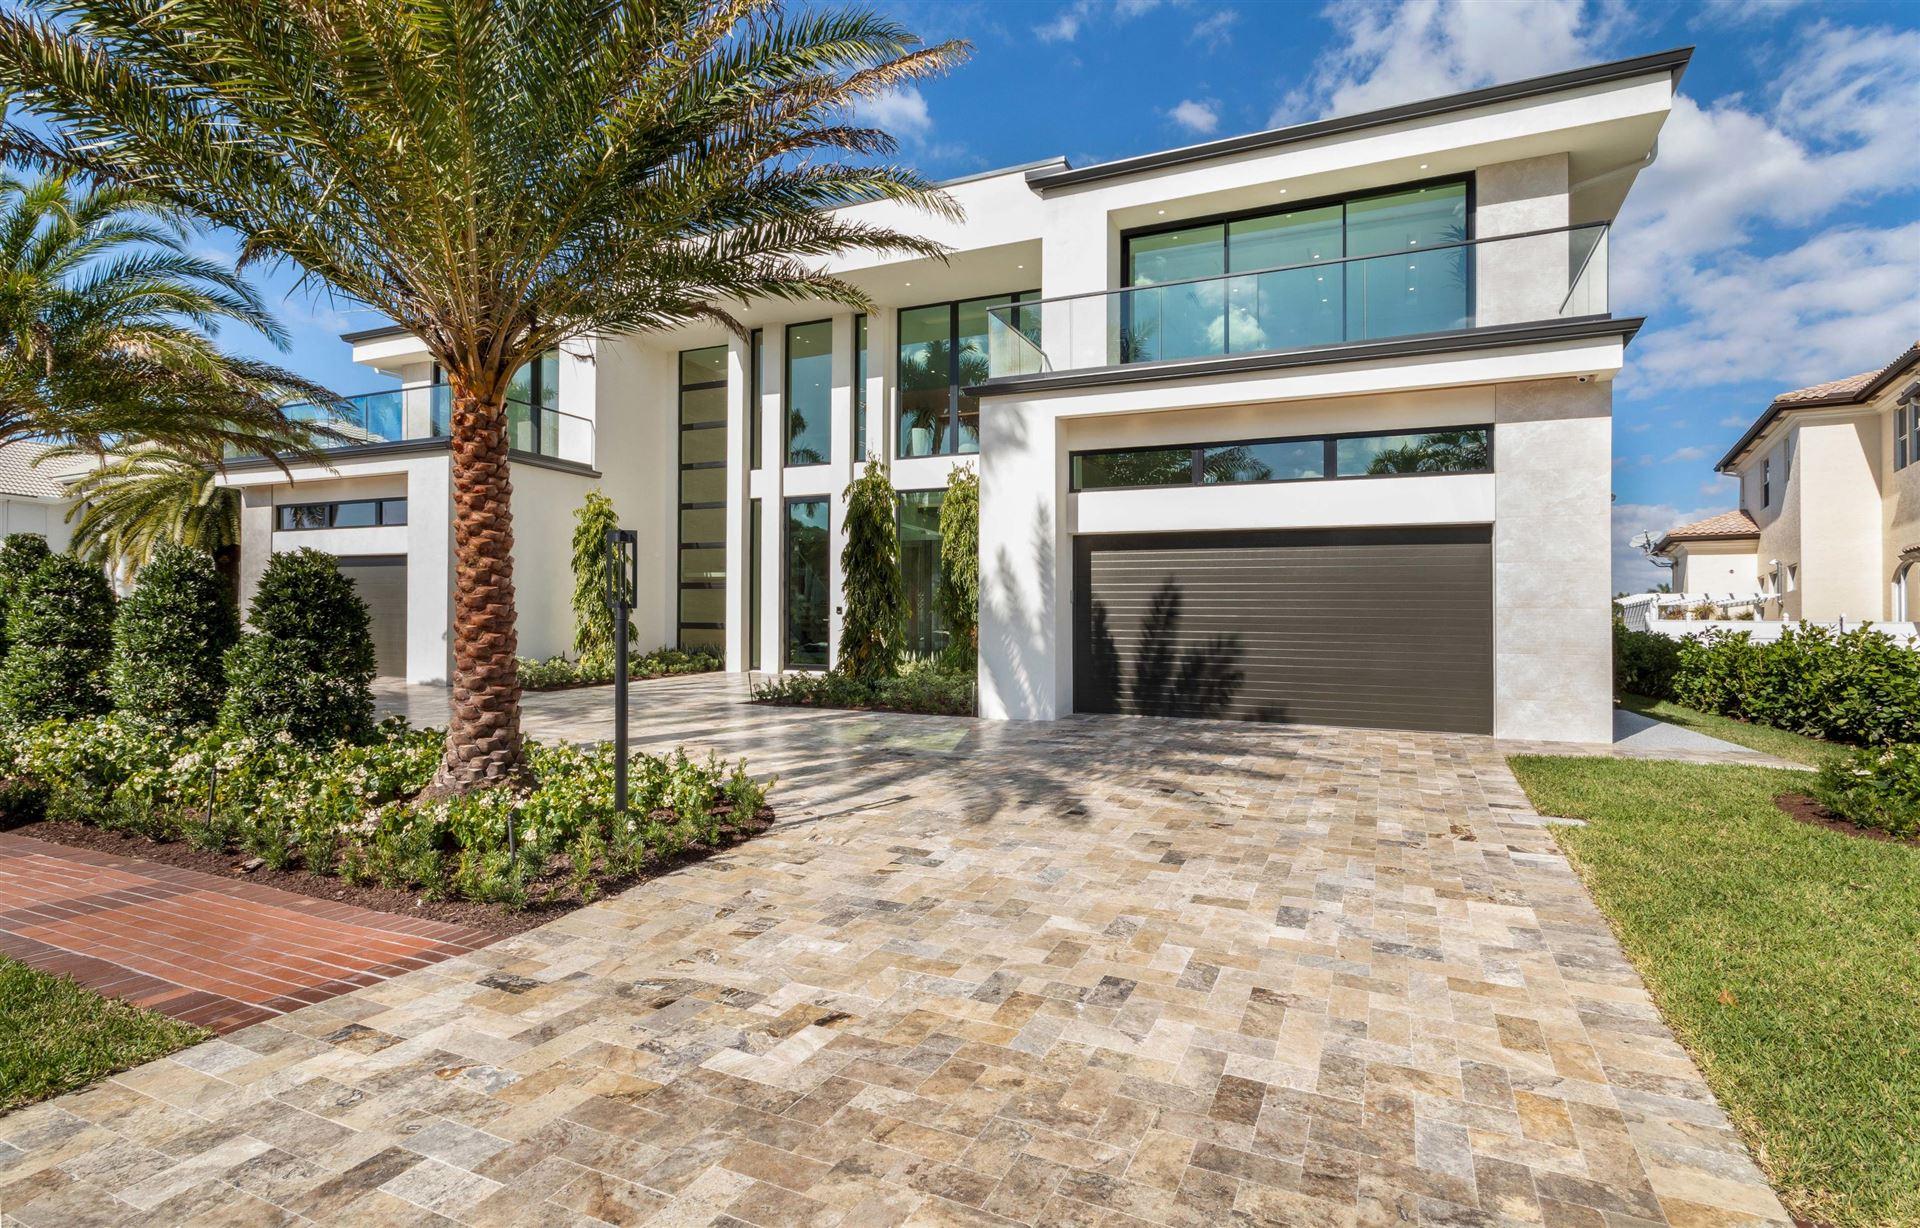 17112 Northway Circle, Boca Raton, FL 33496 - #: RX-10668841